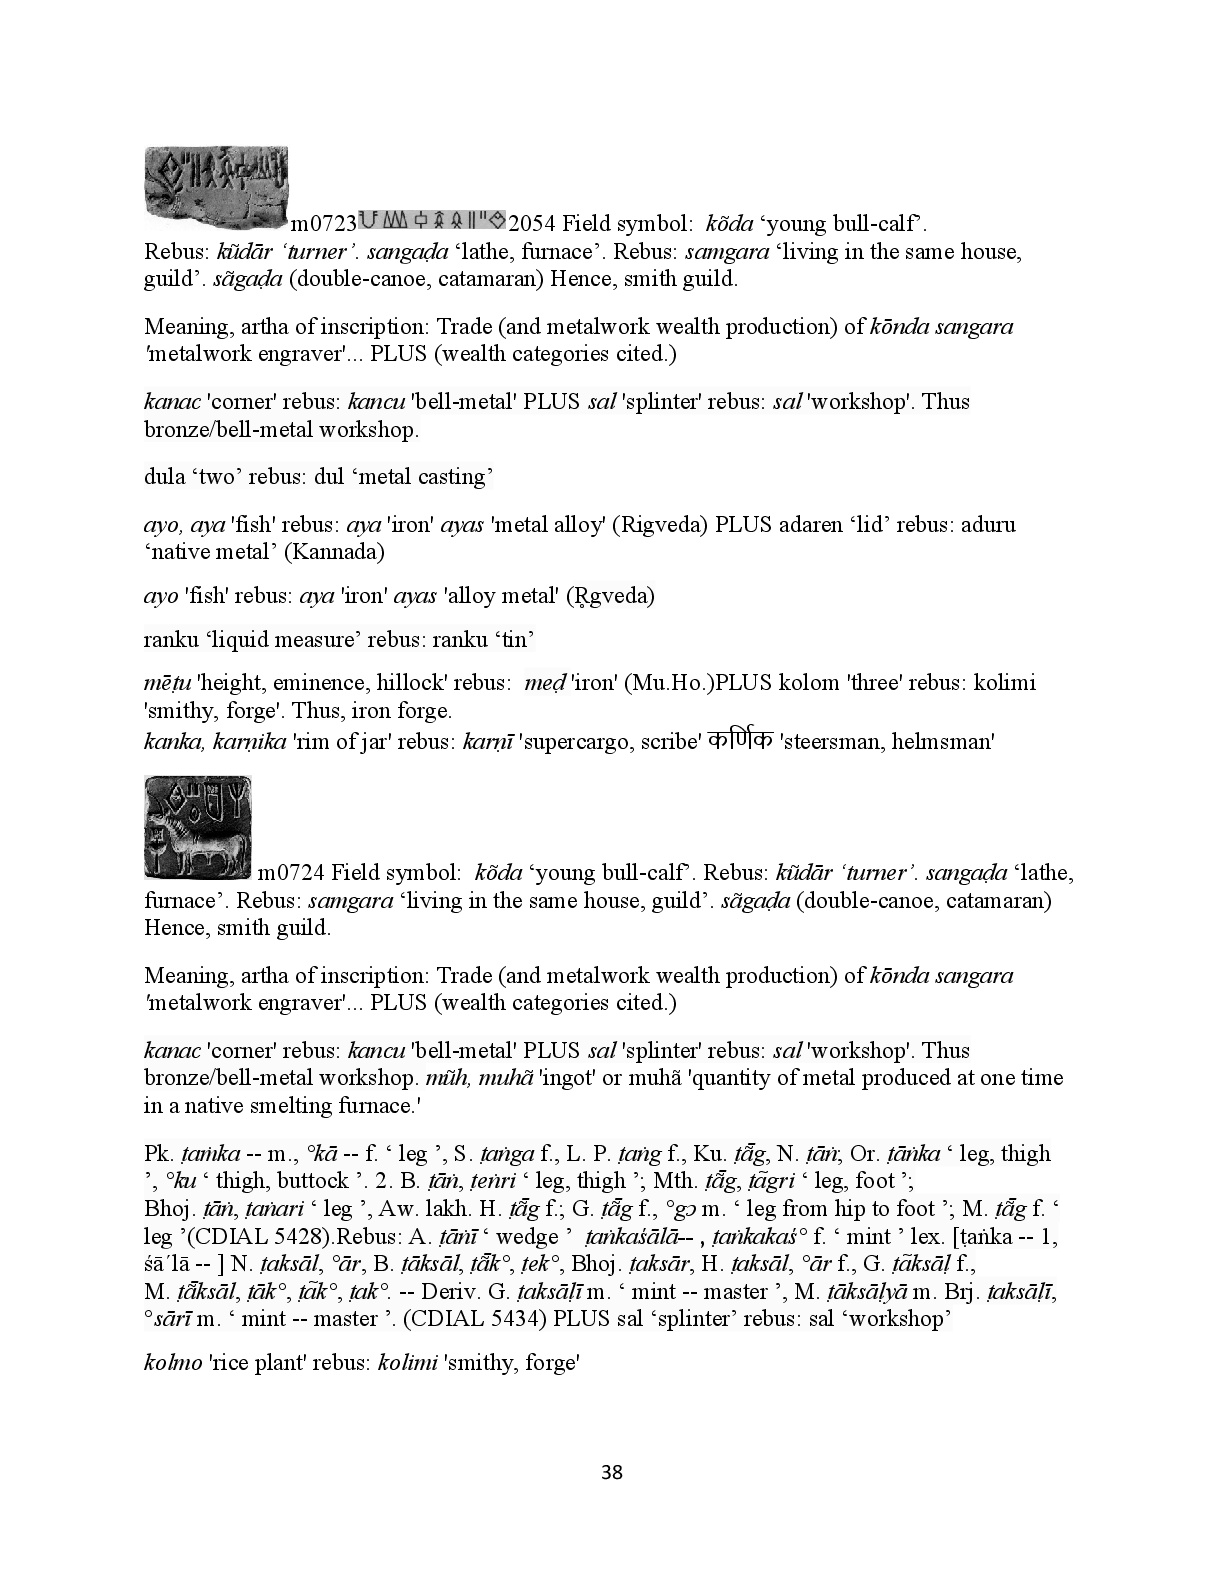 Set 18 Mohenjo daro inscriptions VākyapadÄ ya m627 to m873